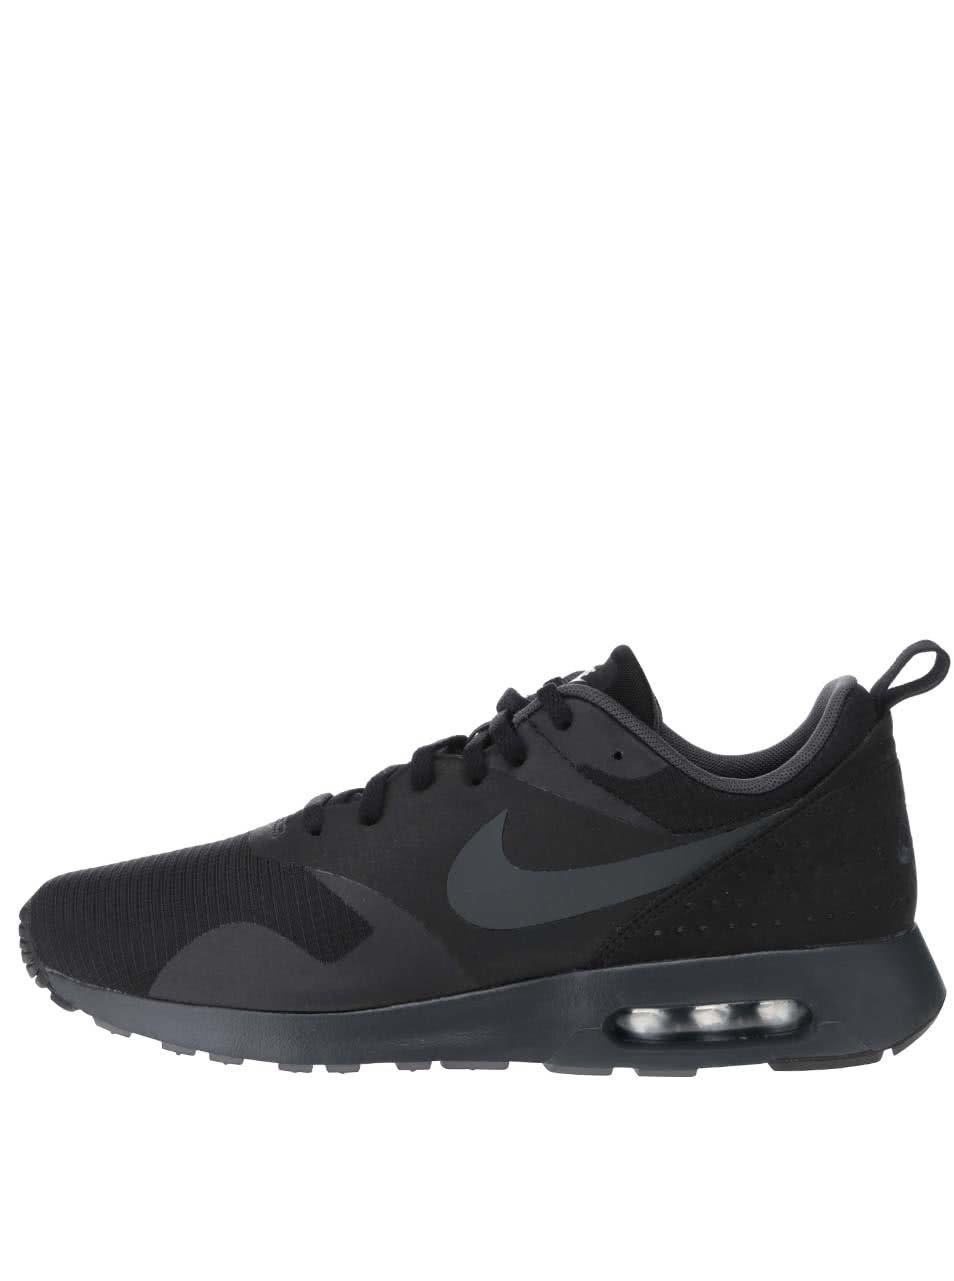 Černé pánské tenisky Nike Air Max Travas ... 6afa650d79